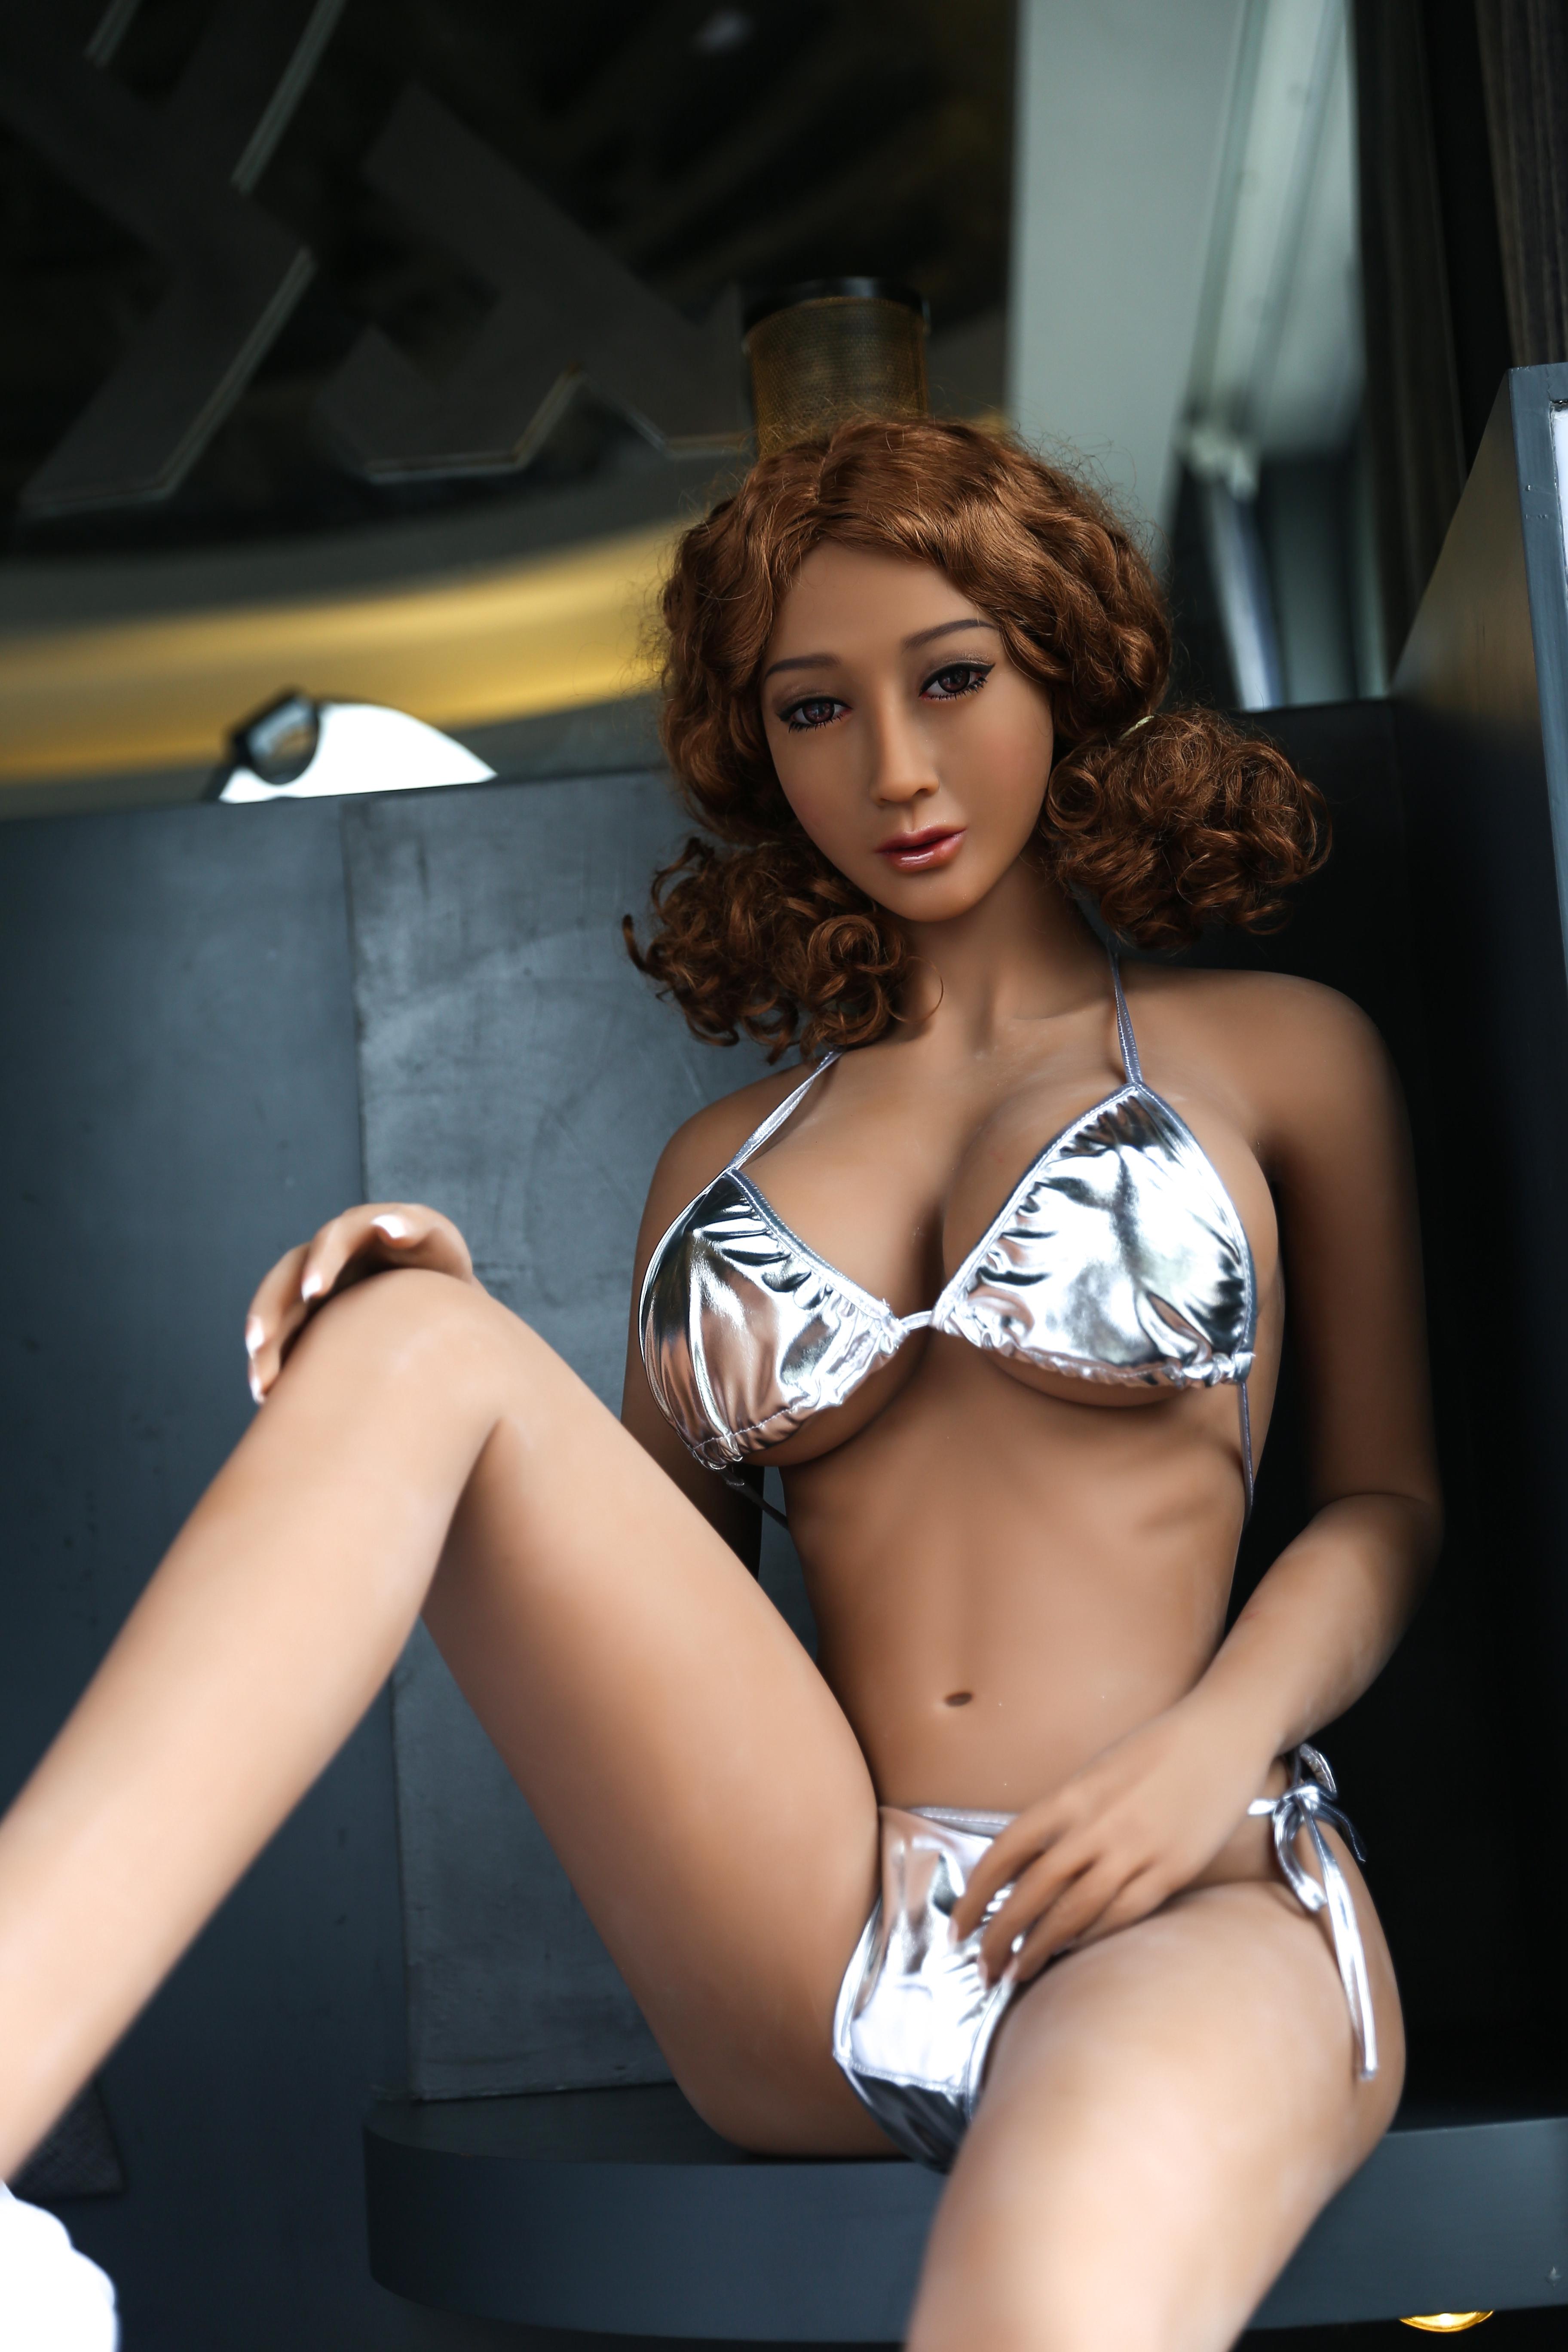 Brown Curly Hair Heatable TPE Sex Doll Katie - 165cm